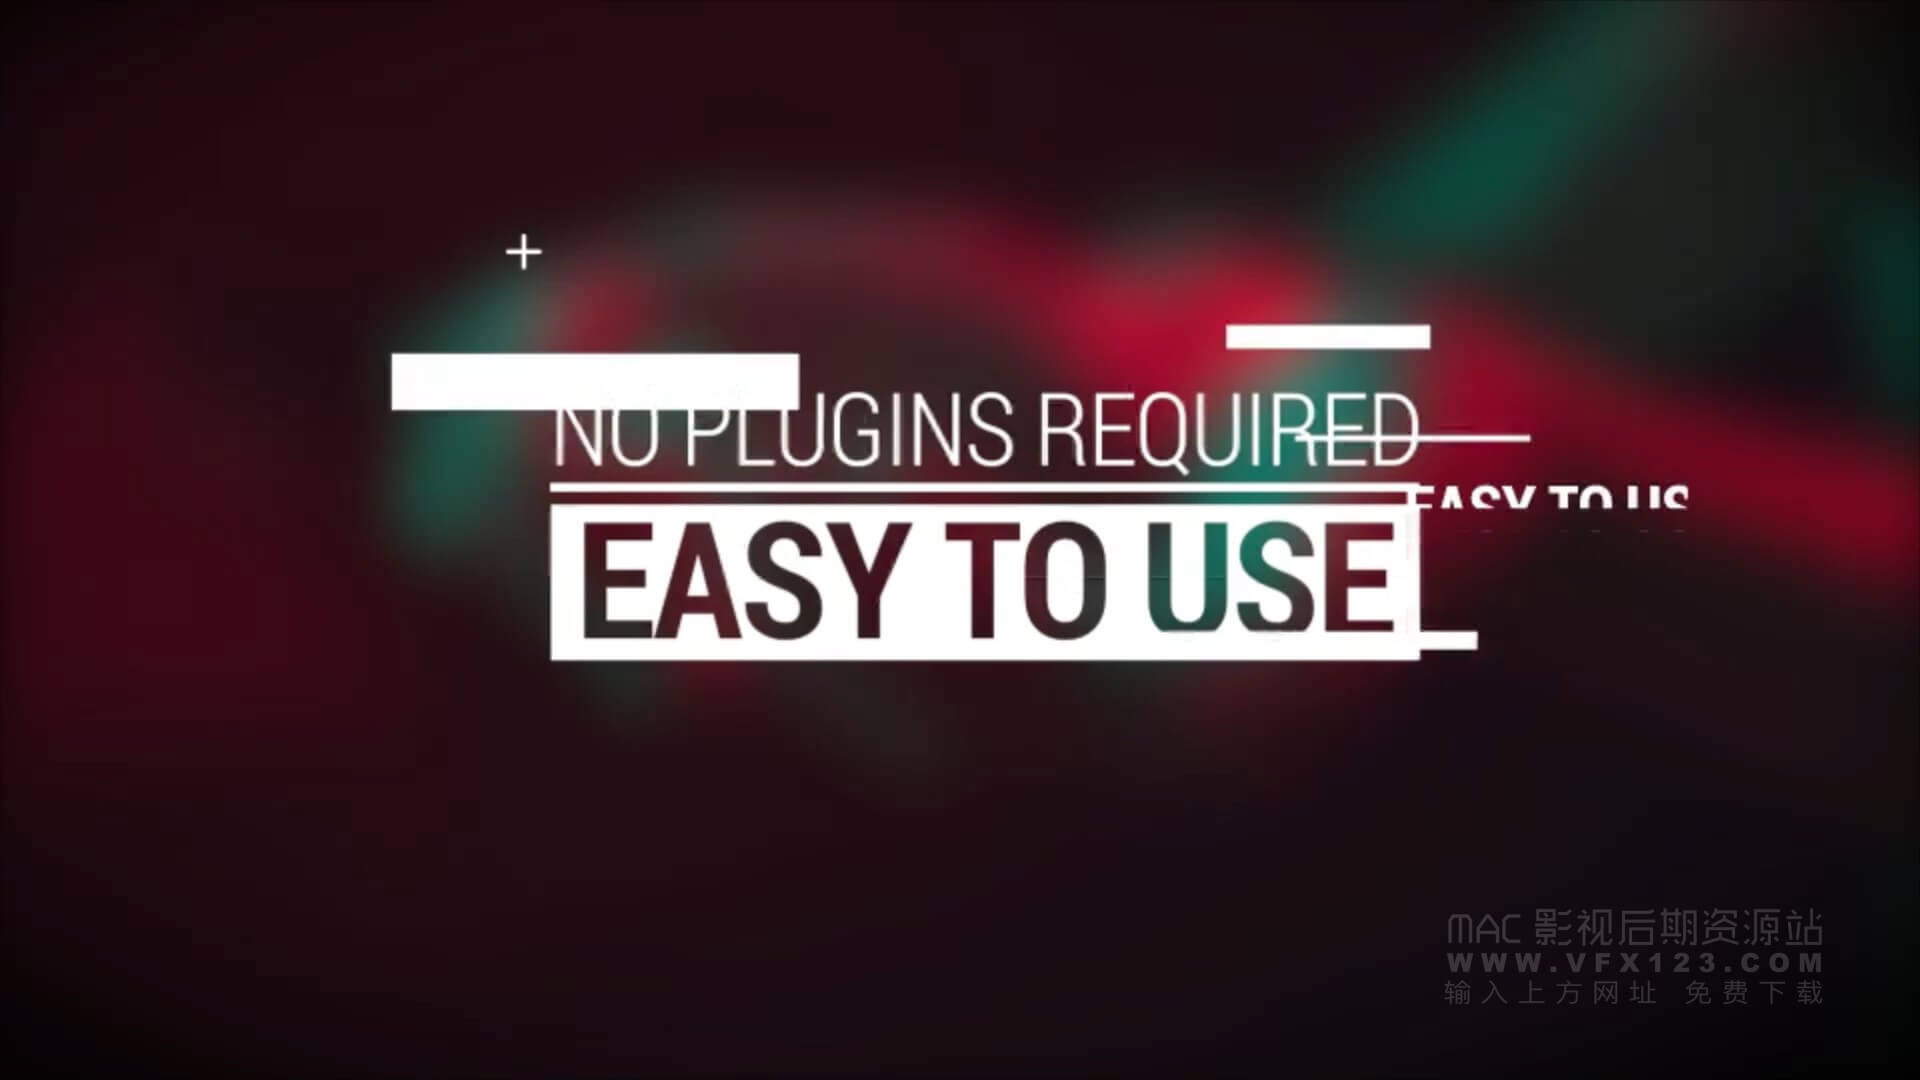 Fcpx标题模板 15种信号失真故障干扰字幕 motion模板 Glitch Titles